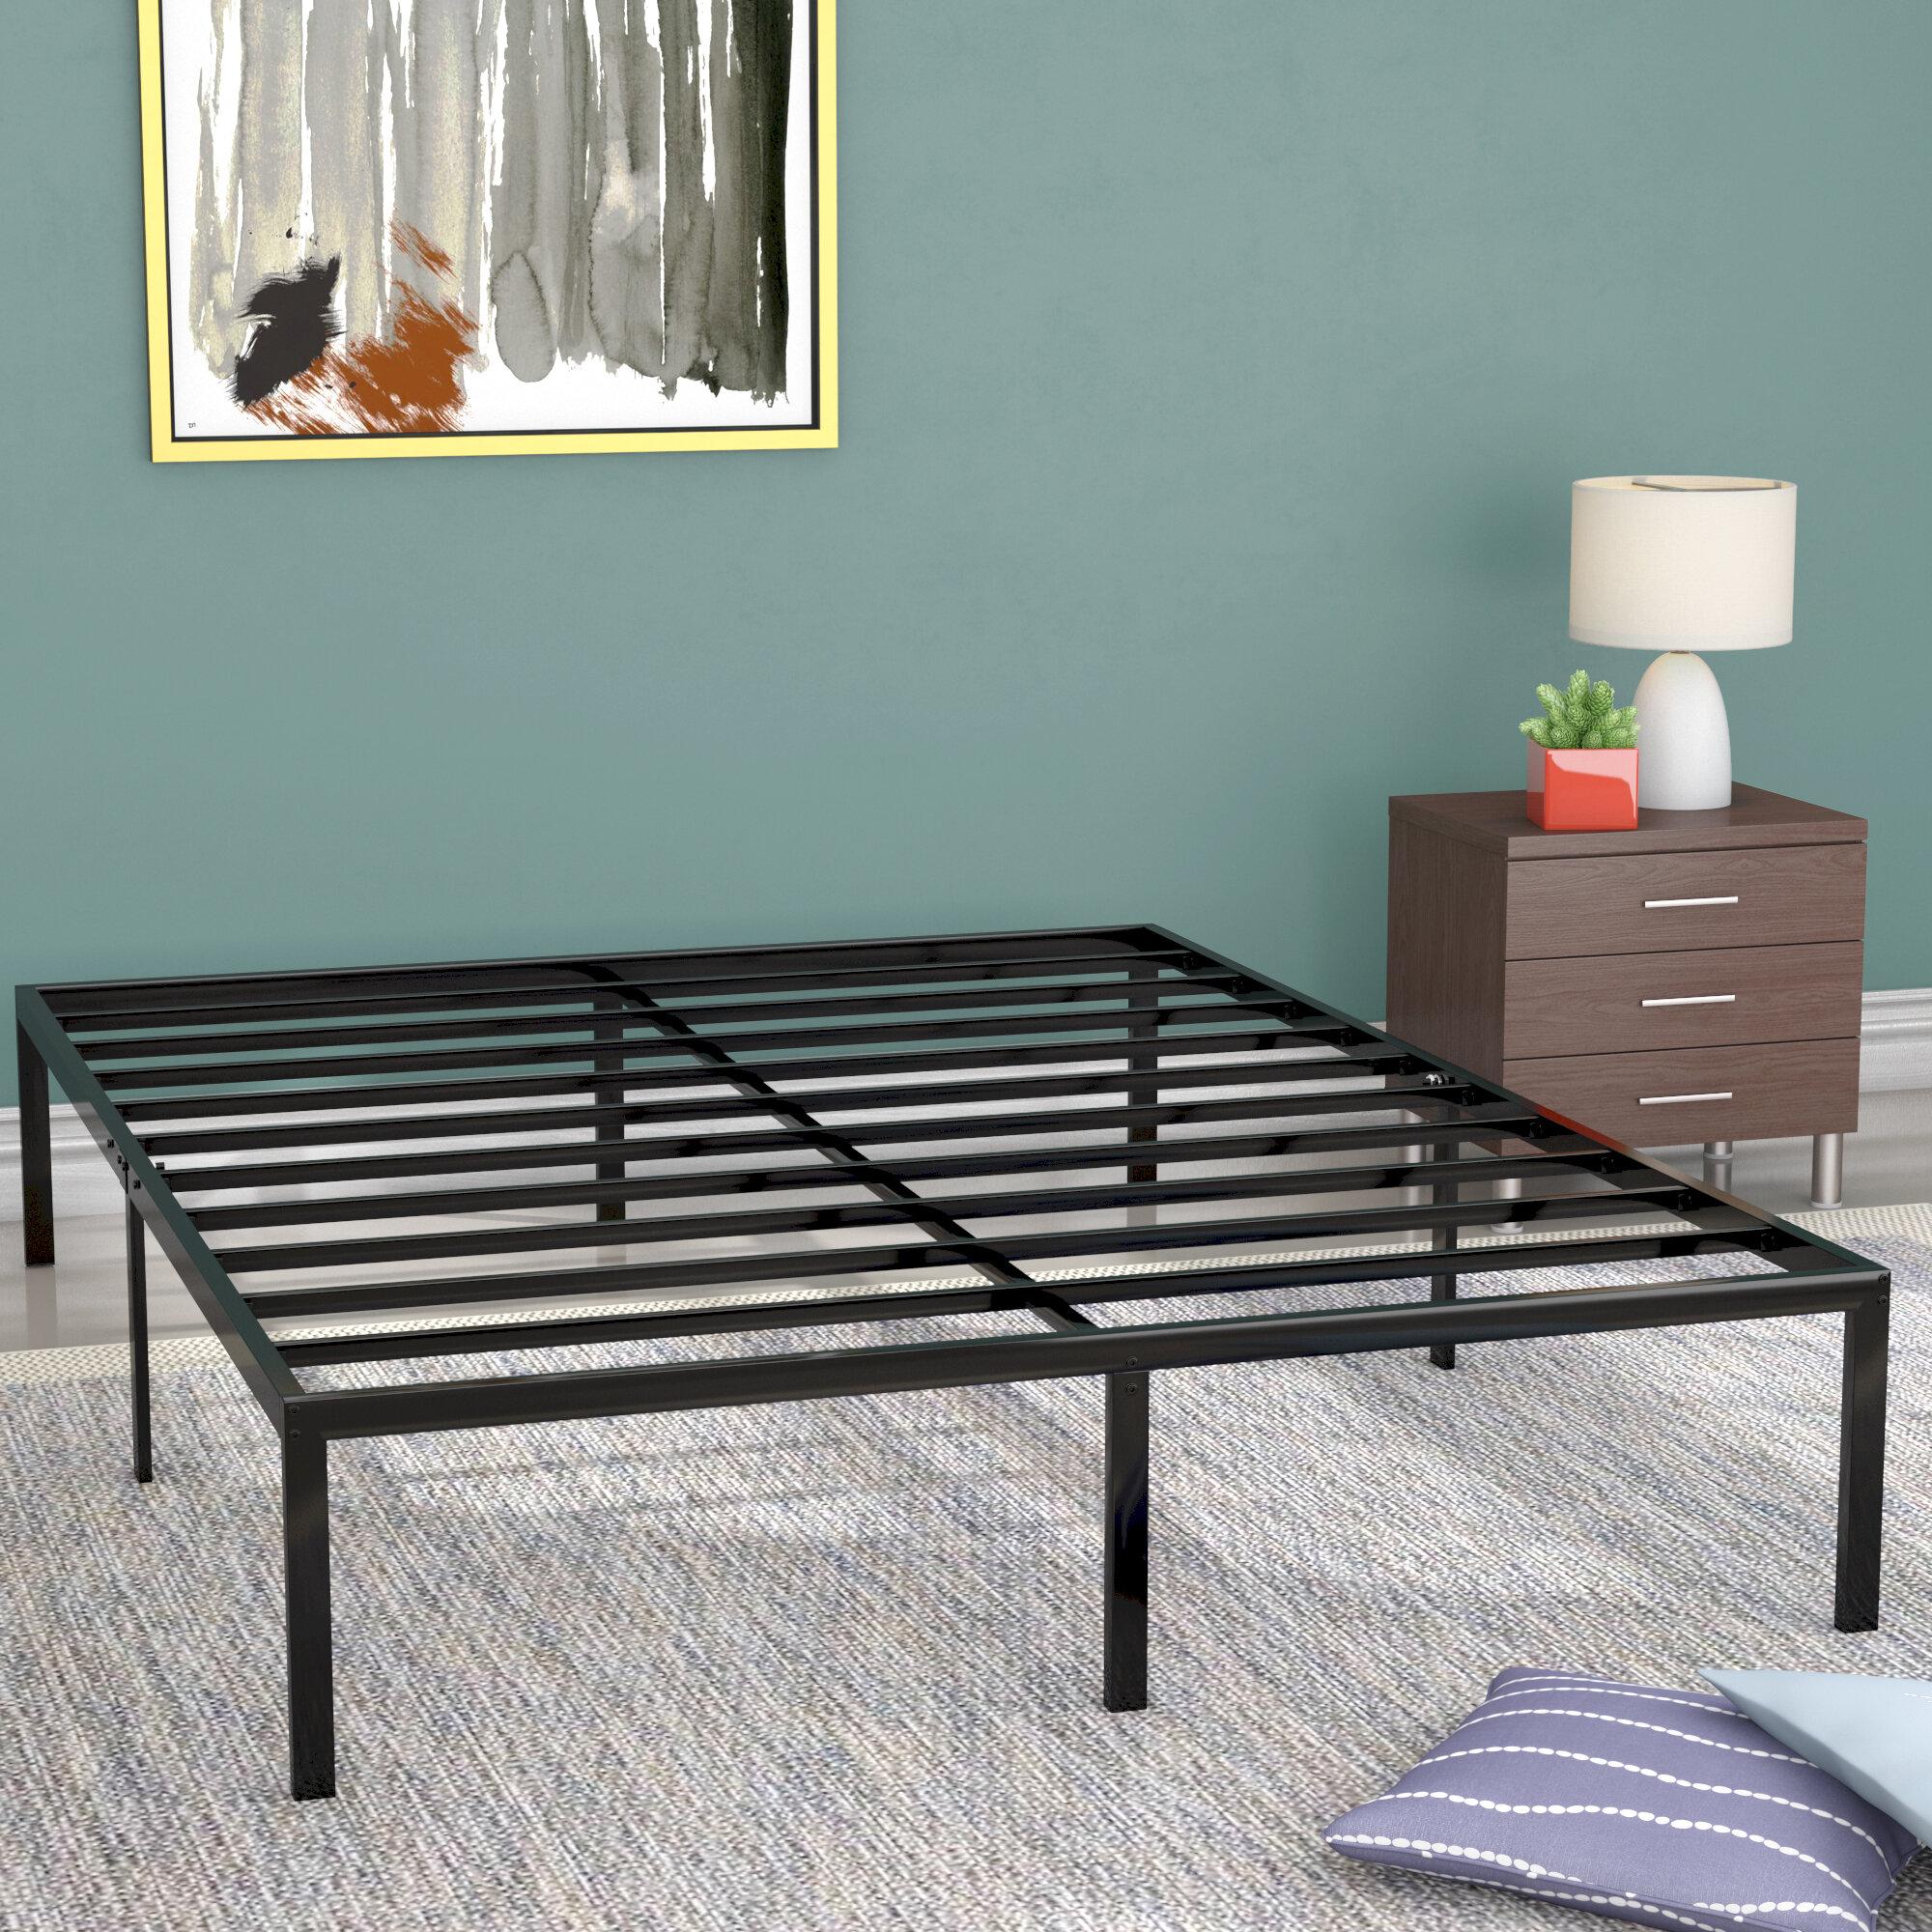 Alwyn home classic metal platform bed frame reviews wayfair solutioingenieria Image collections